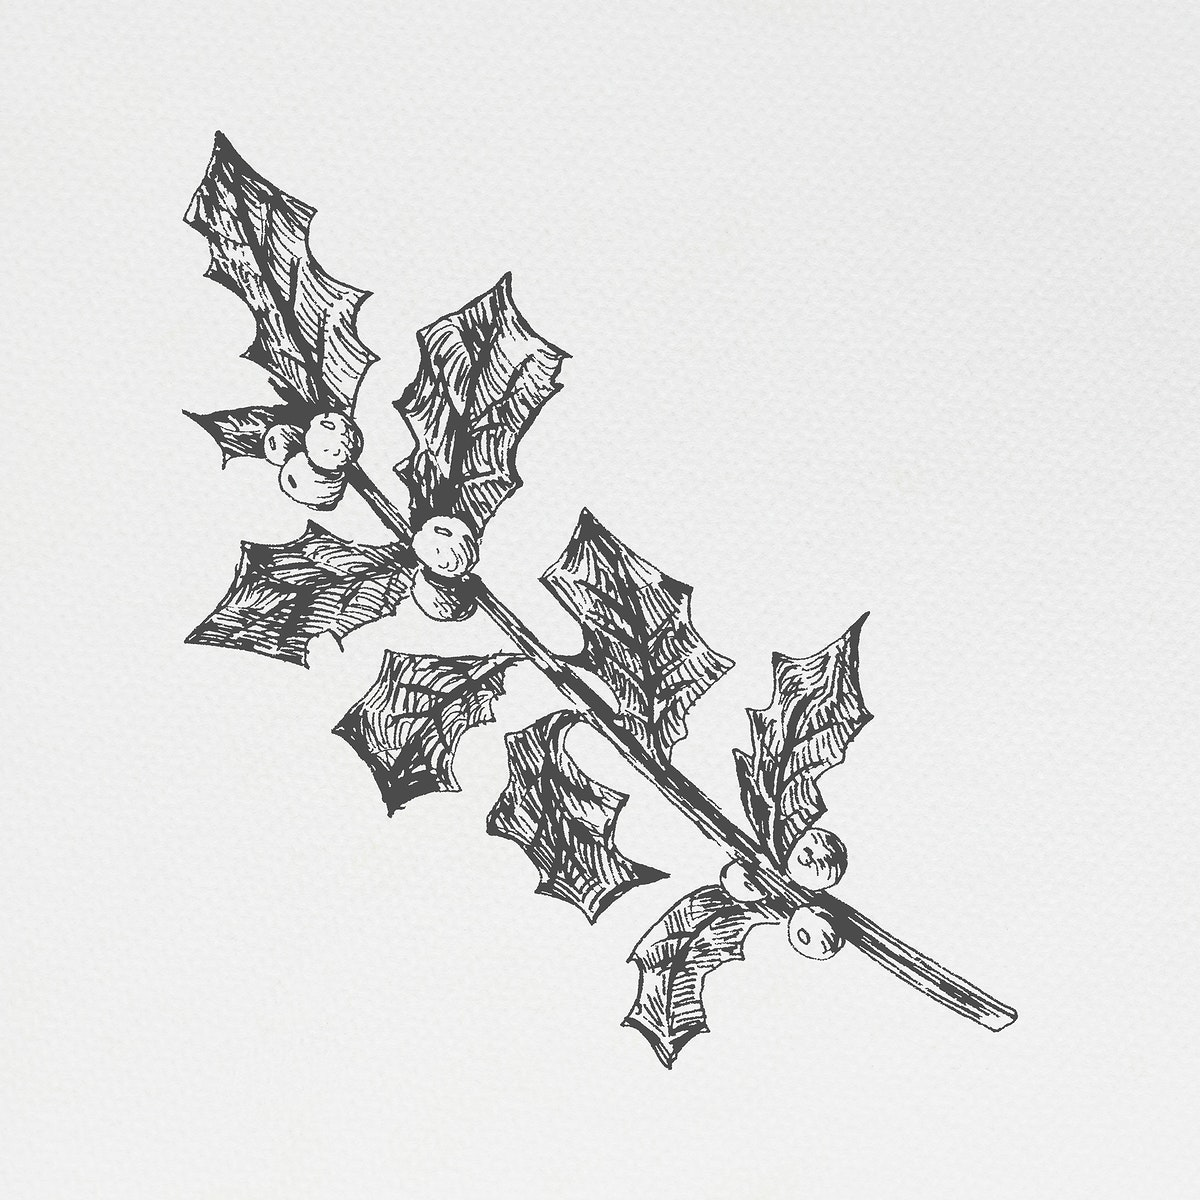 Hand drawn holly branch illustration